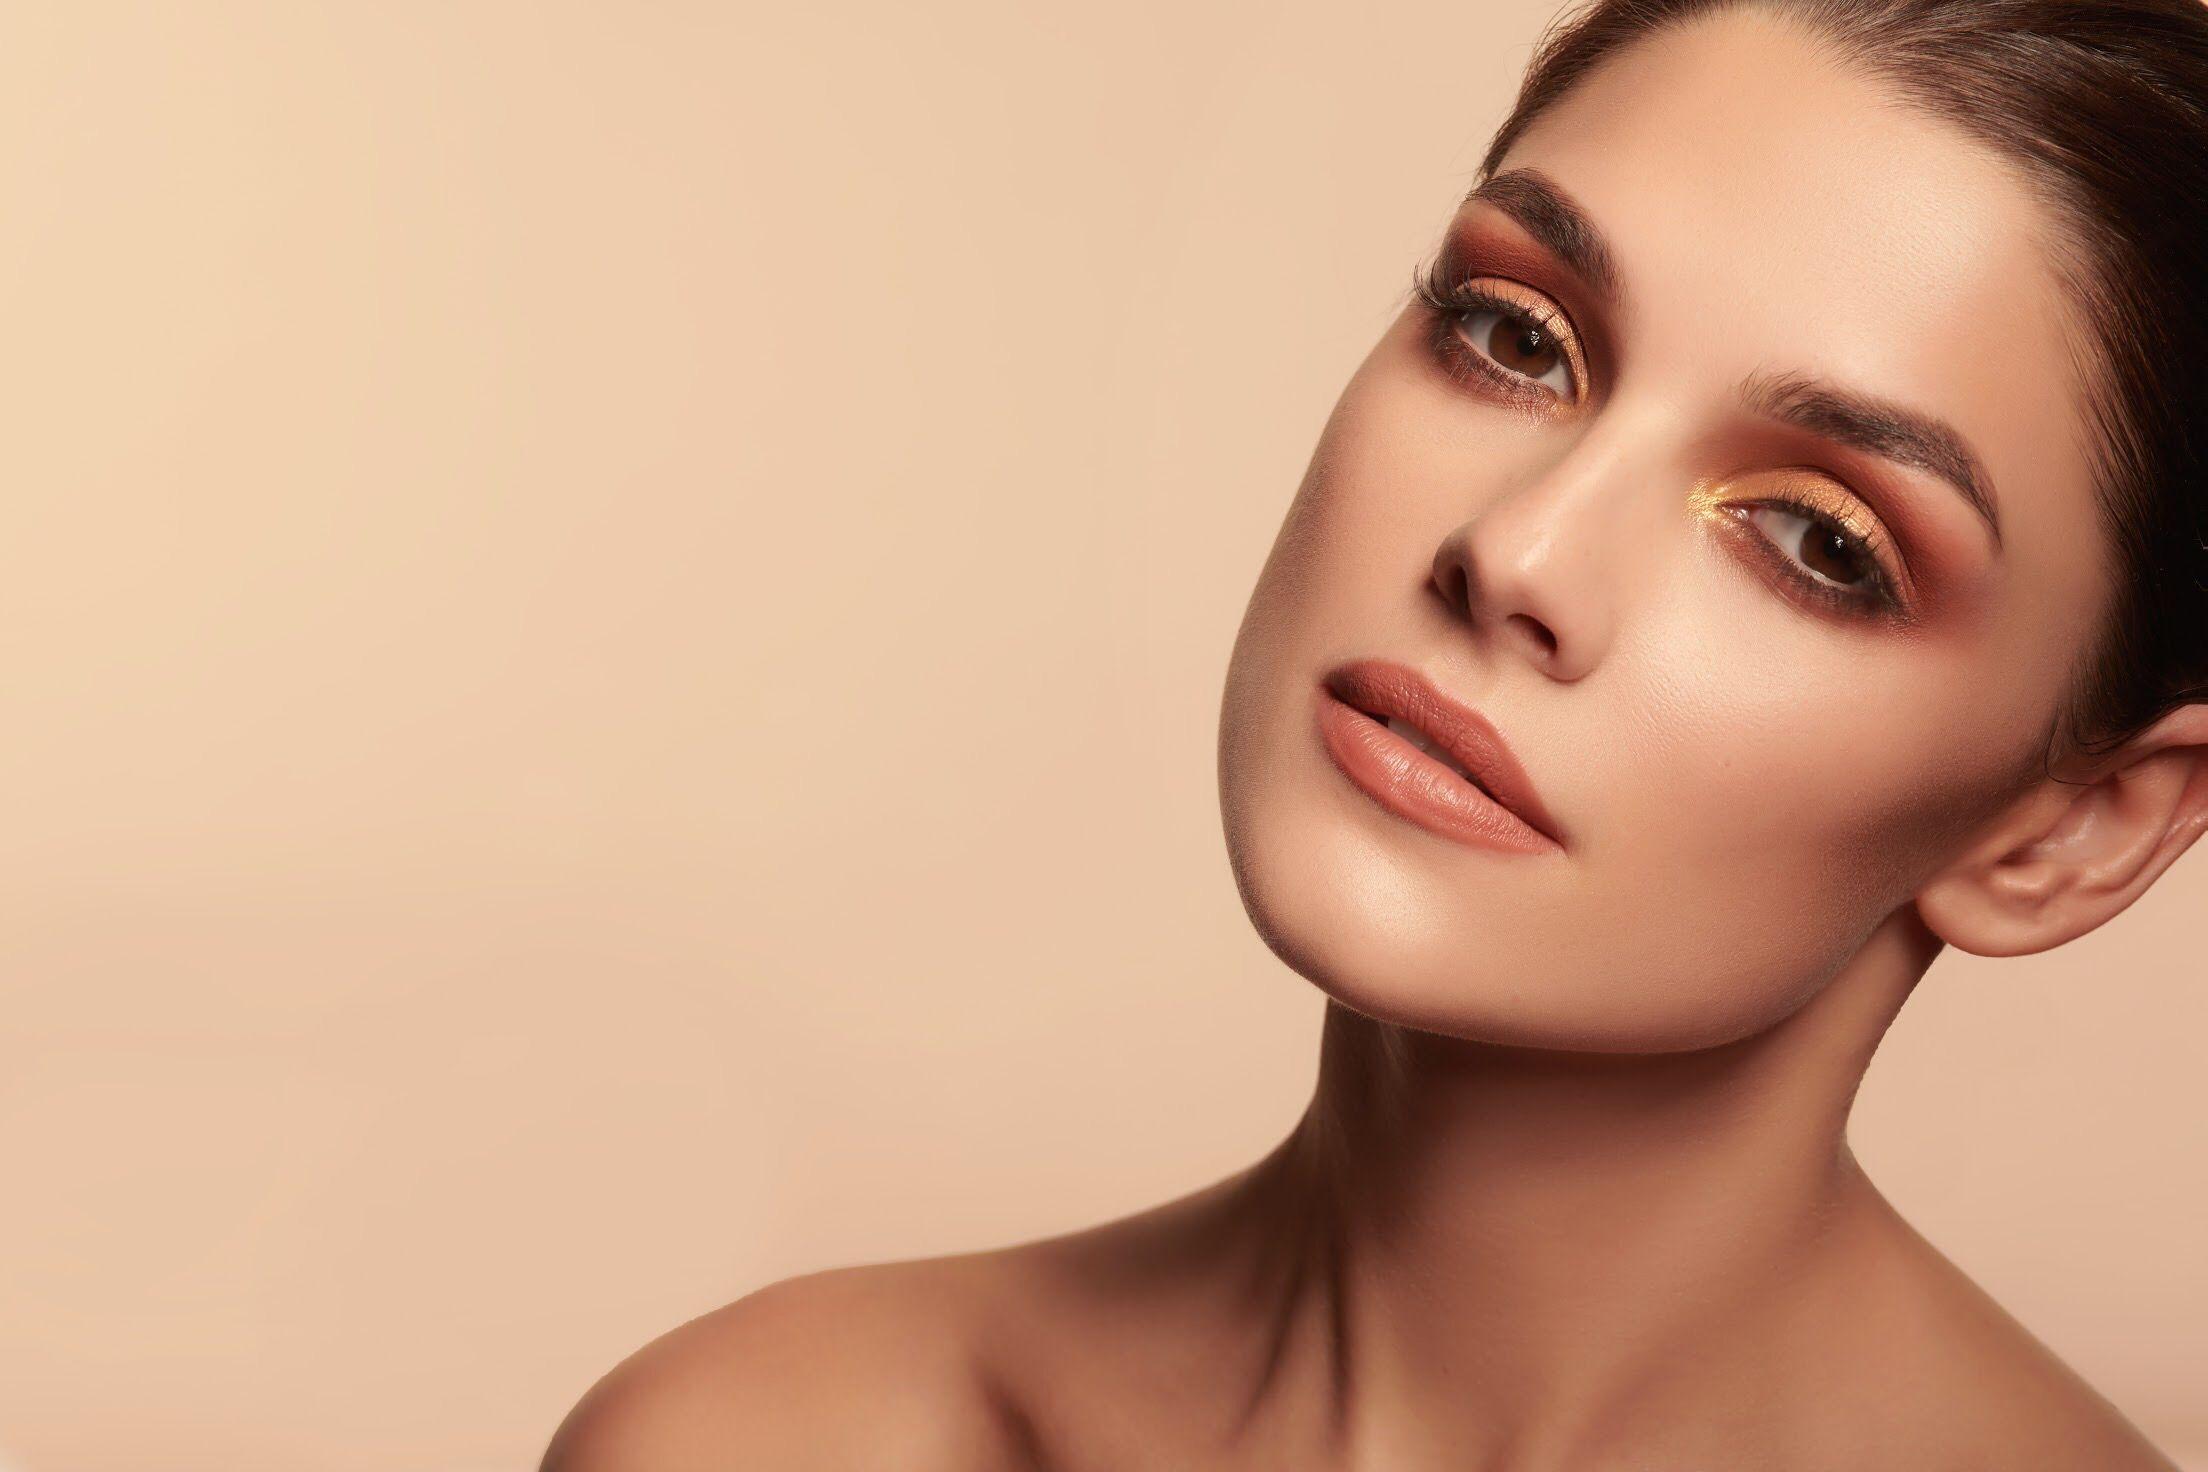 Make Up by paddymcgurgan Makeup, How to make, Makeup artist